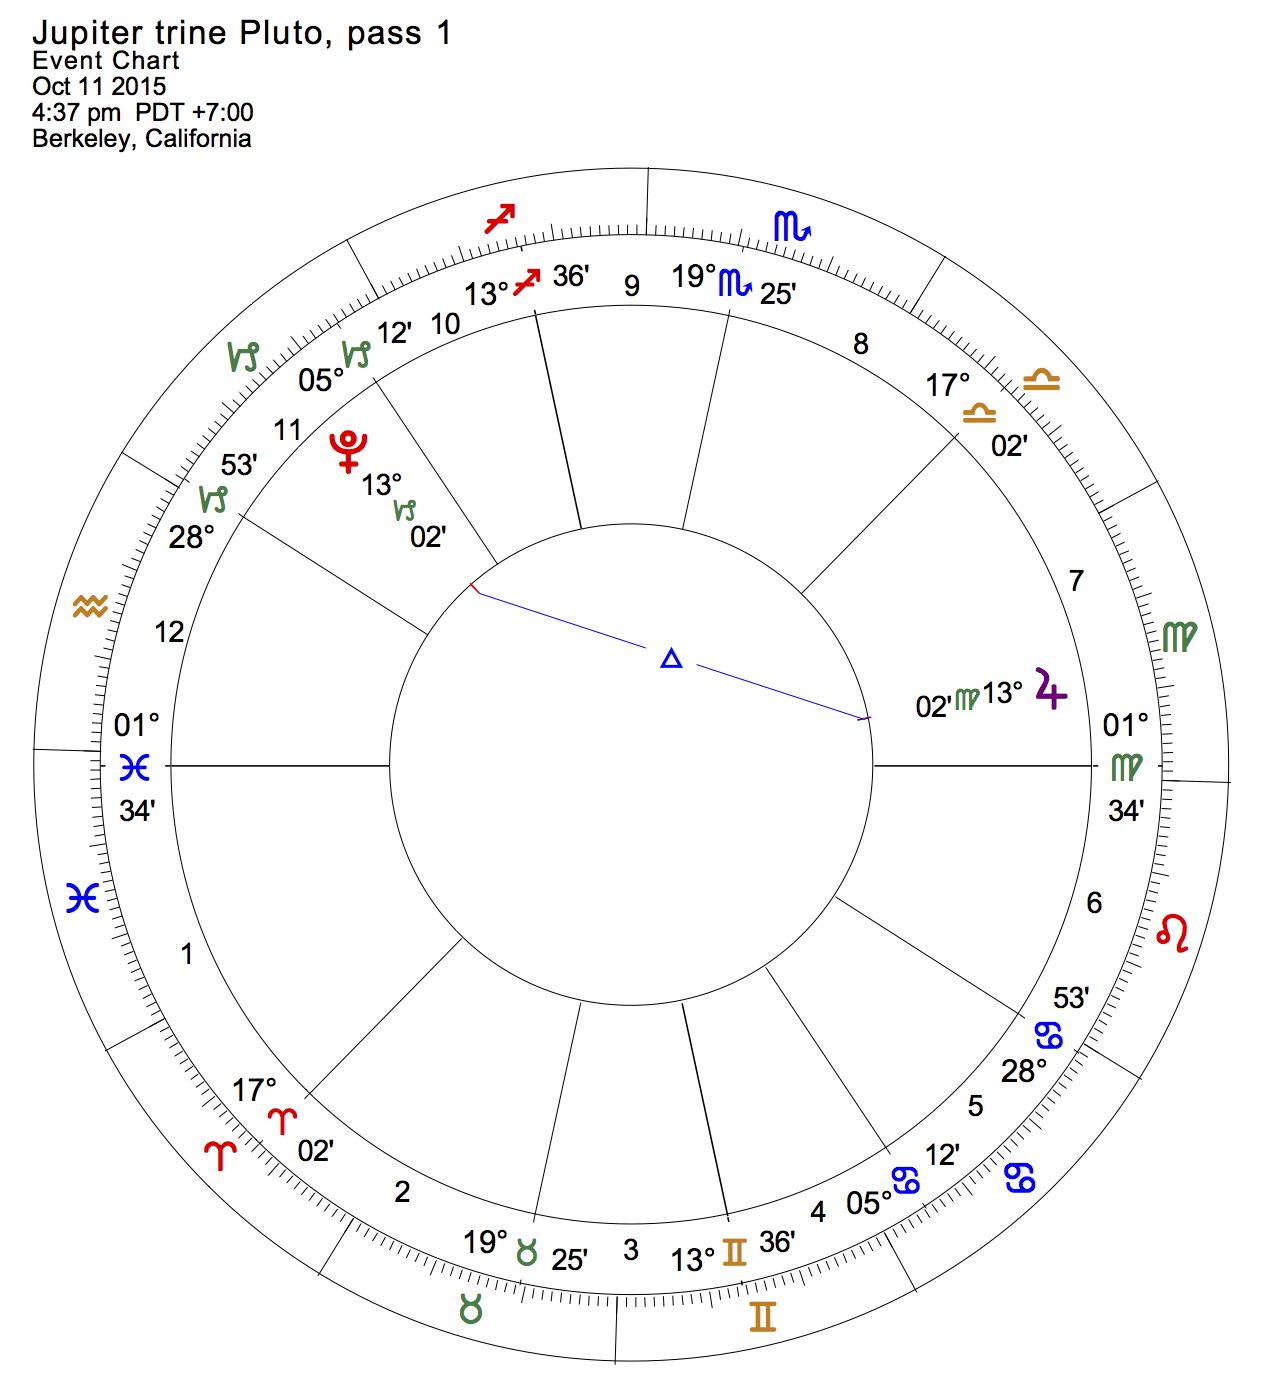 Jupiter trine Pluto, pass 1